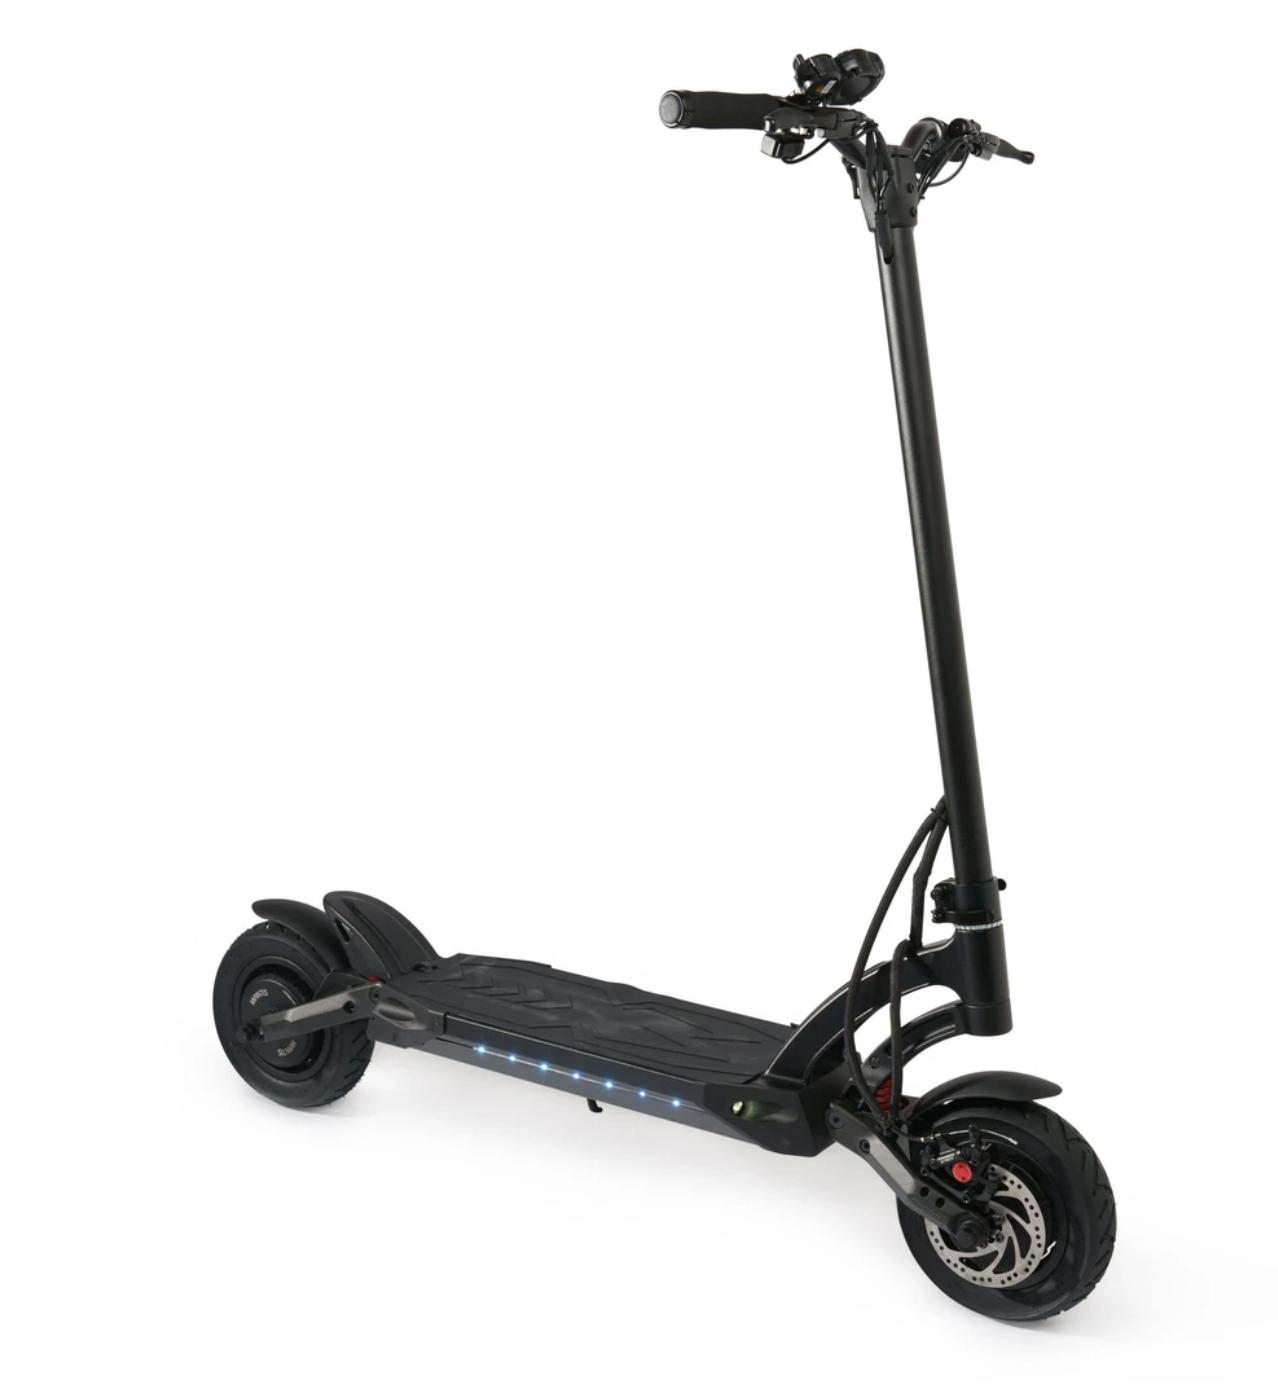 Kaabo Mantis 10 Elite Dual Motor Electric Scooter